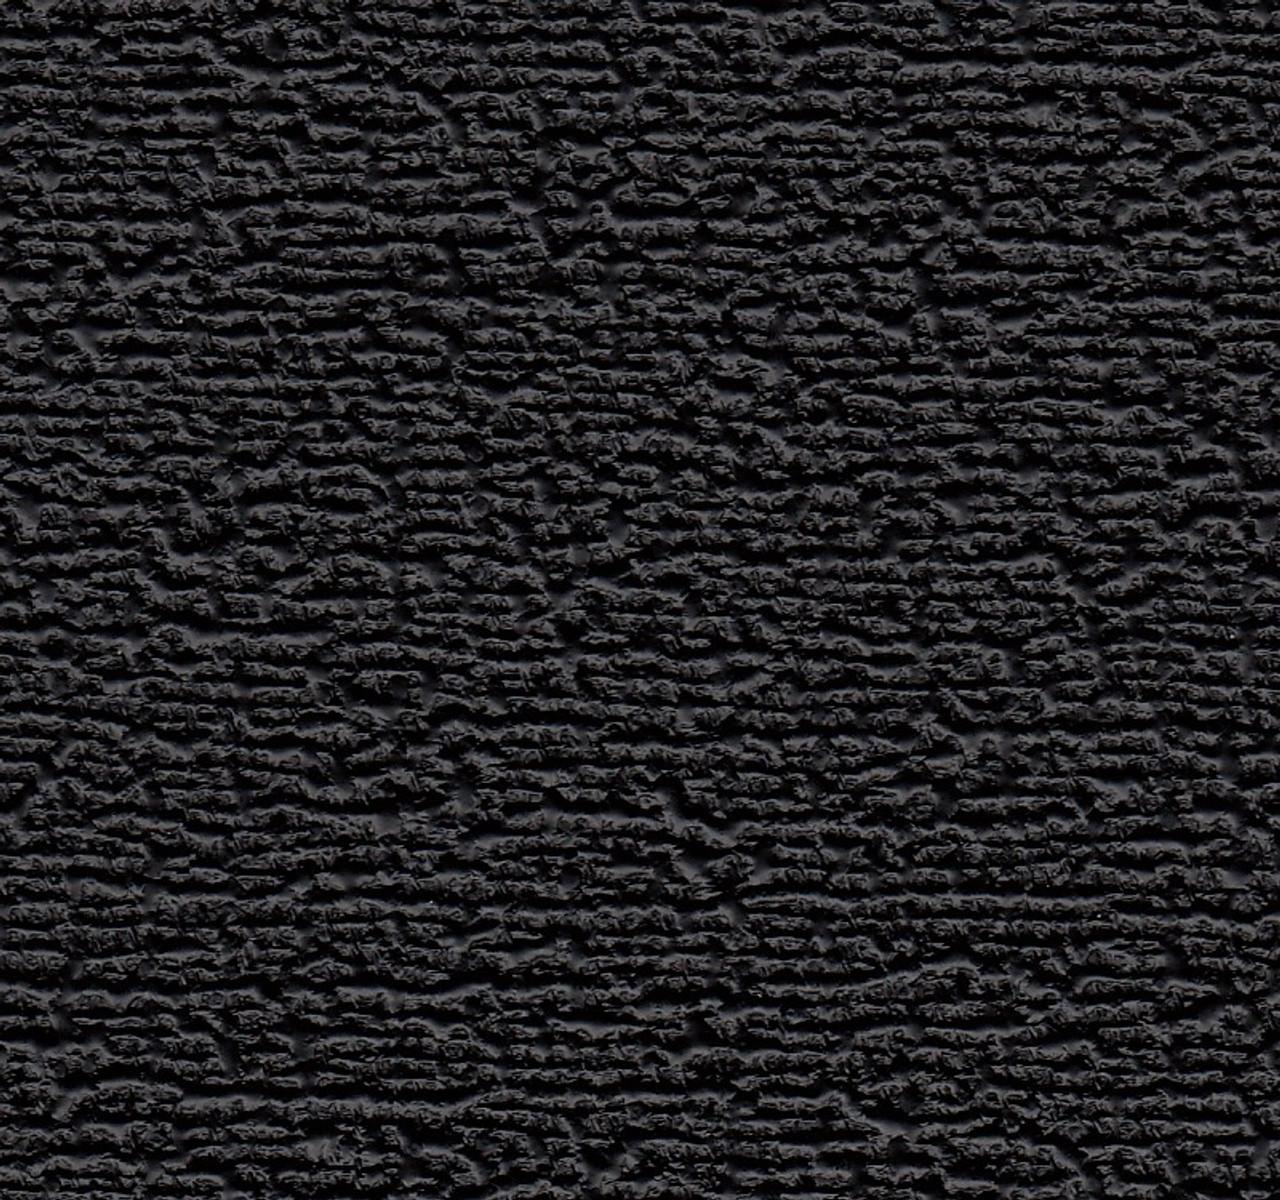 Tolex - Rough/Nubtex Black